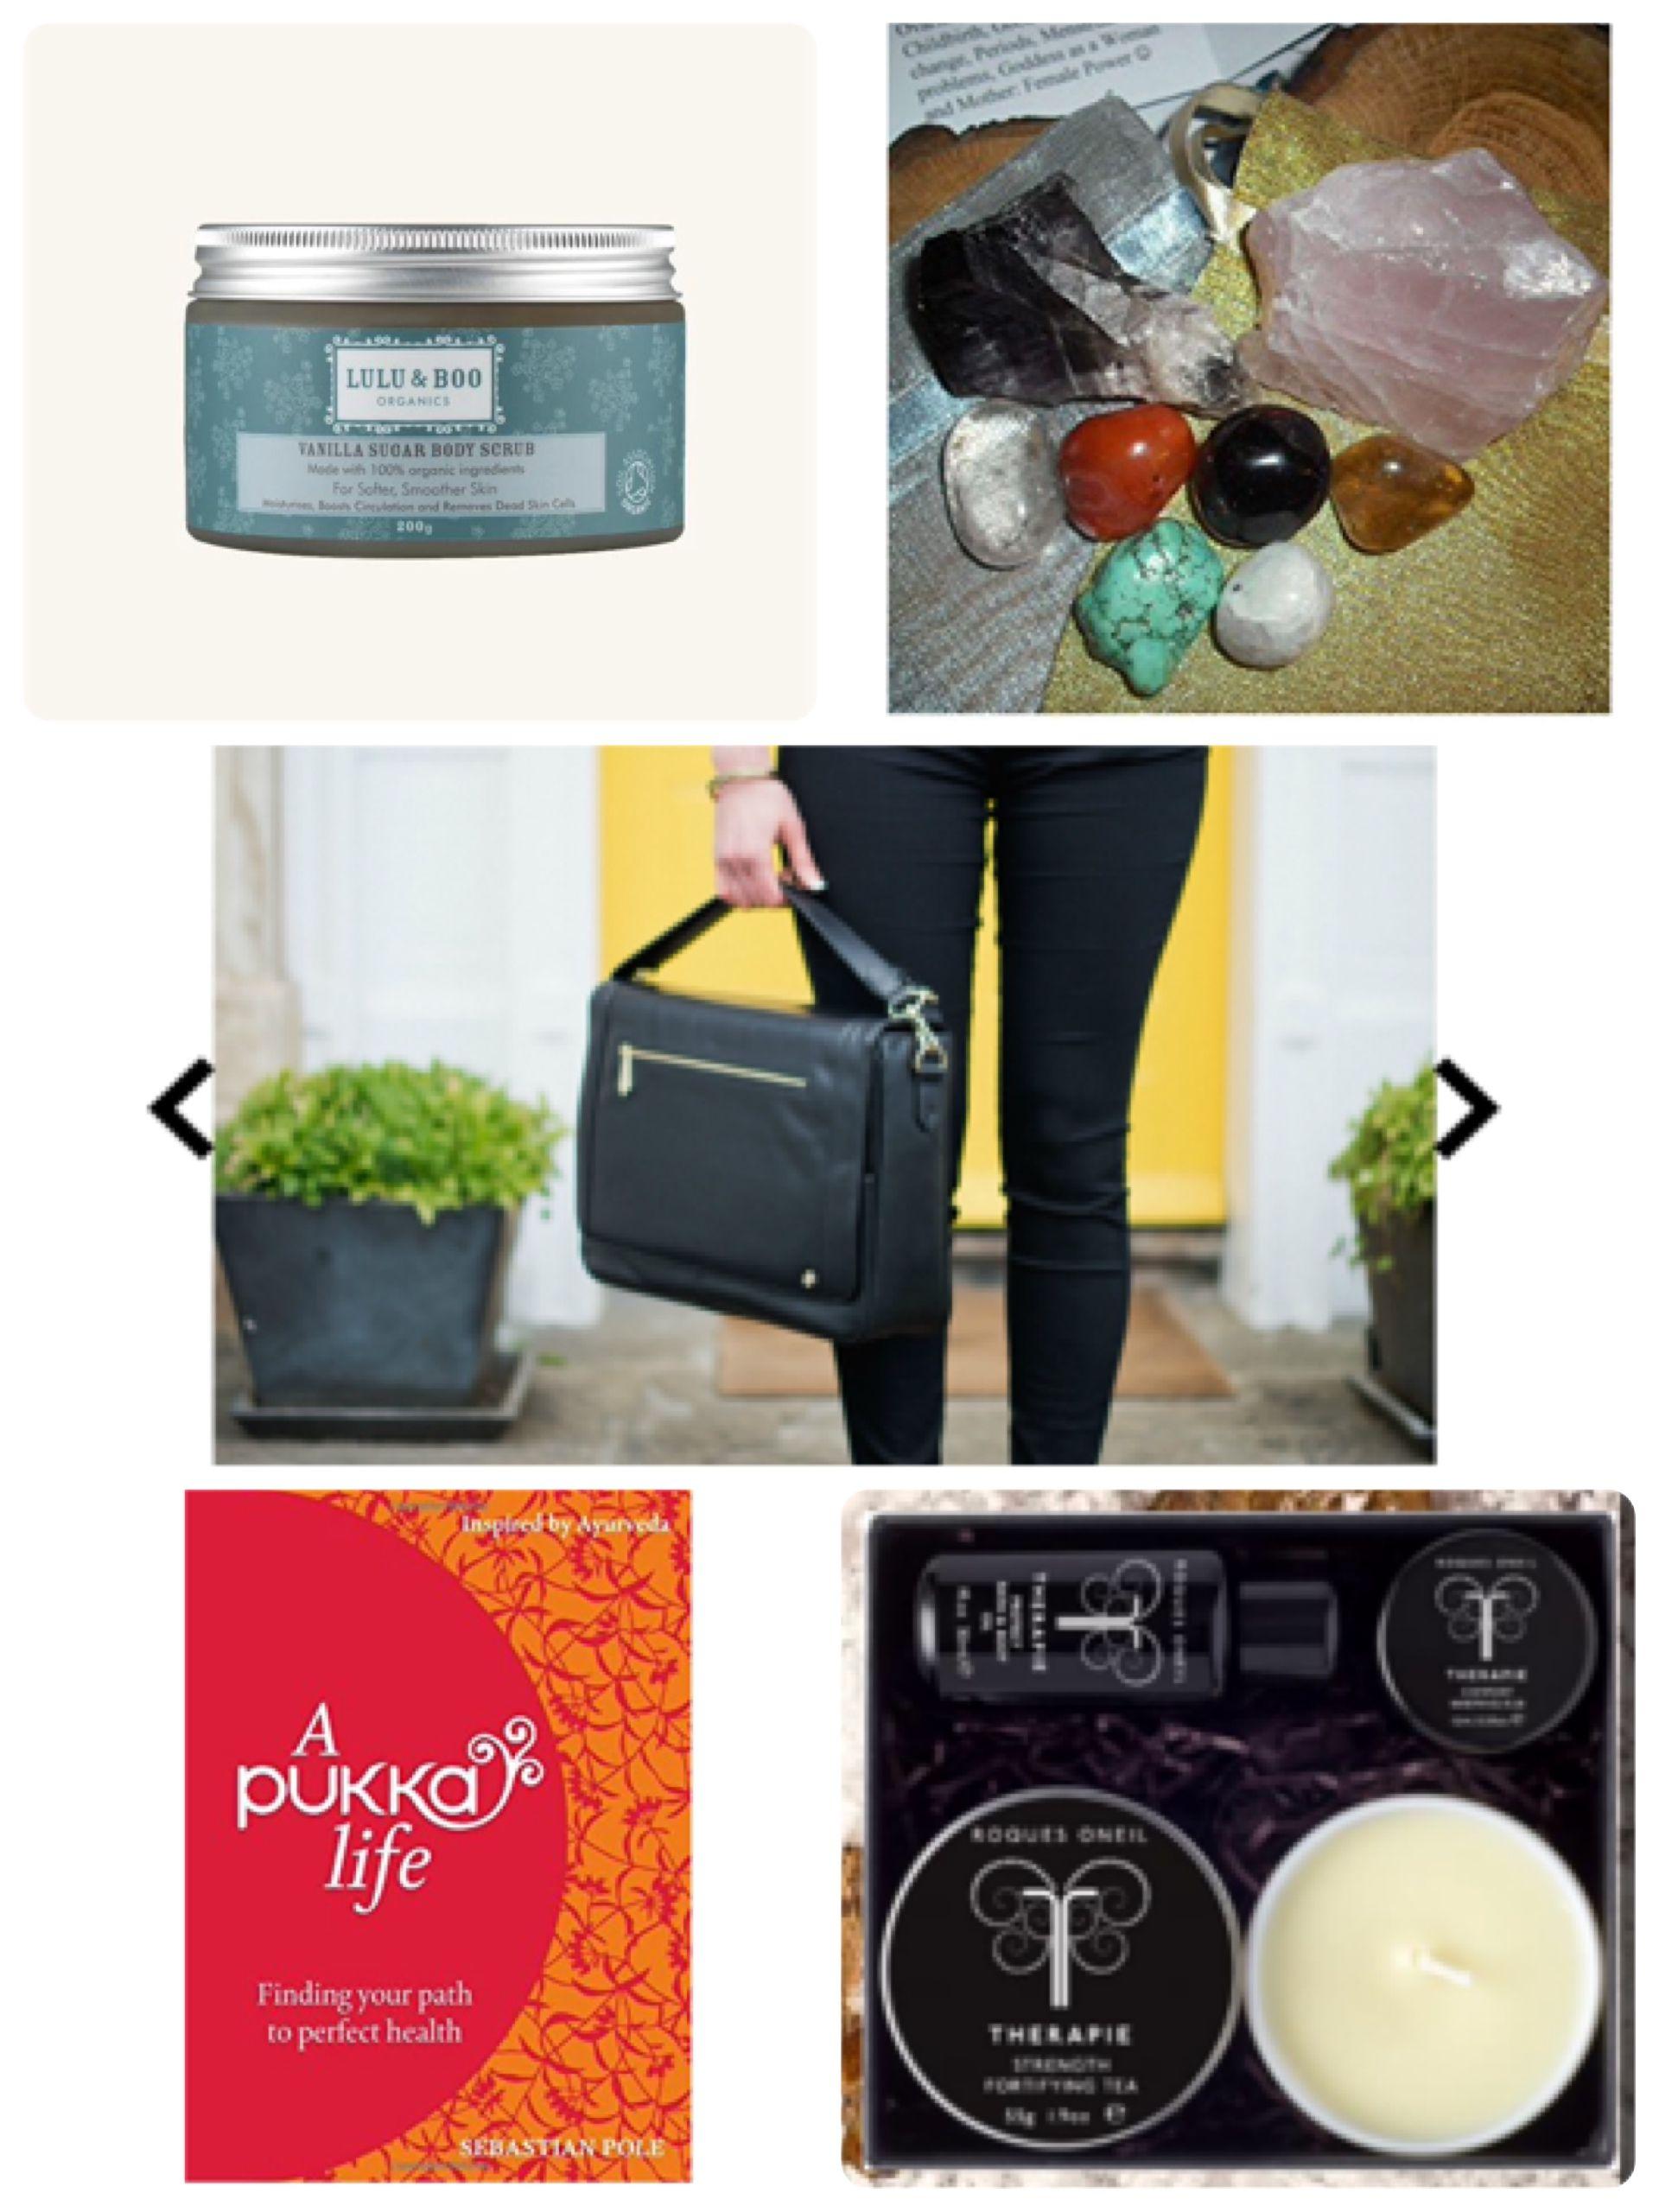 f4c4c9cab83 Jennifer Hamley Model K.T Work Bag in Black - lush. Plus 4 other items that